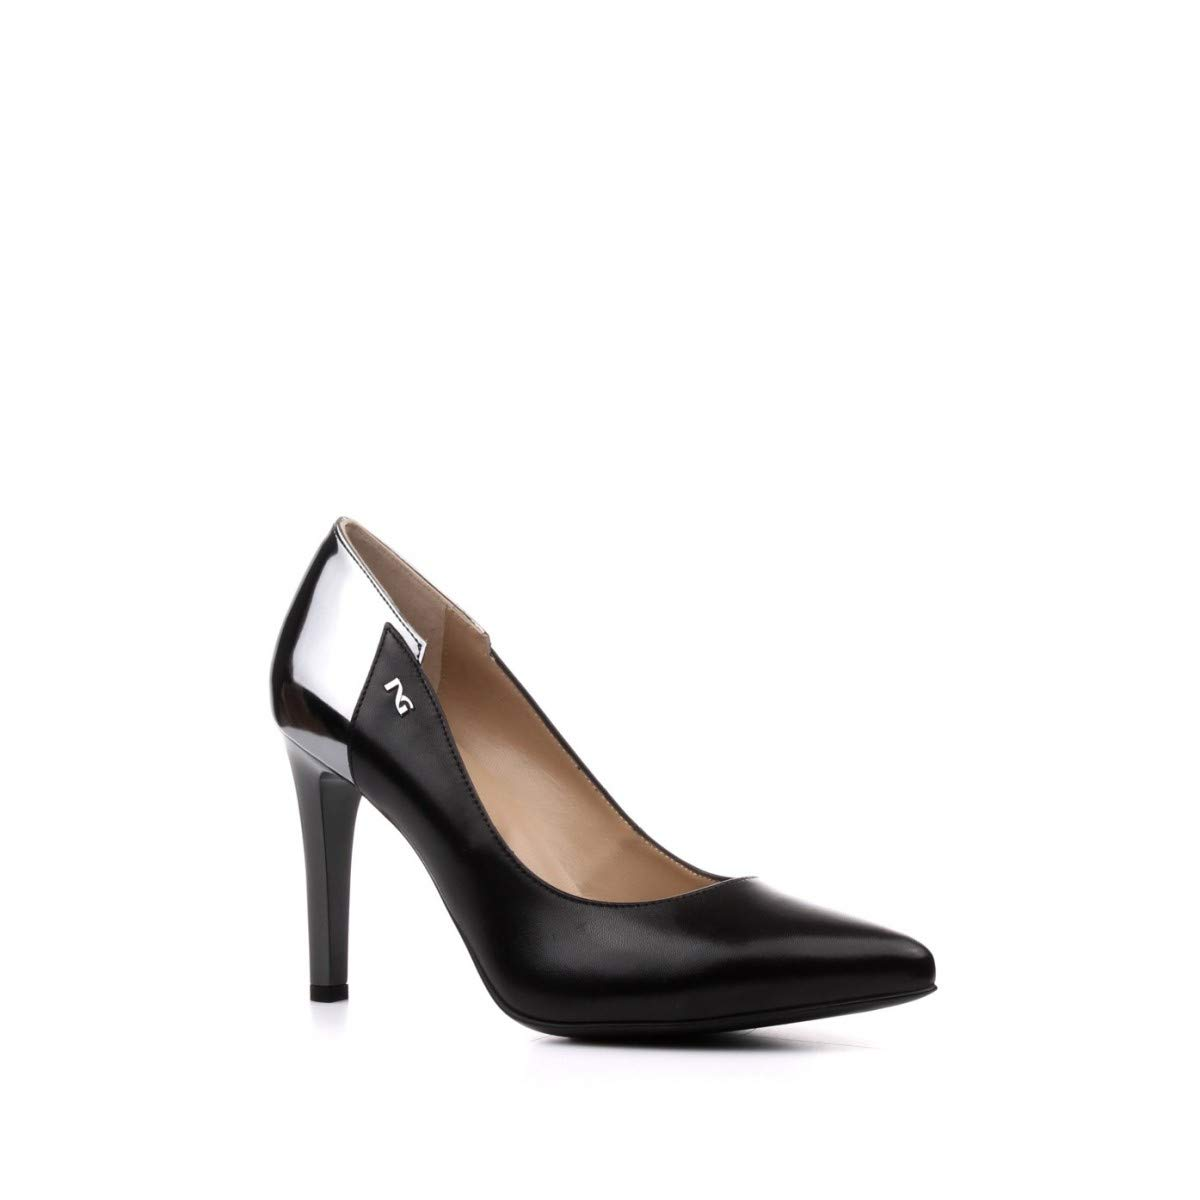 Nero Giardini DECOLT NEROGIARDINI A909340DE100 A909340 9340 Chaussures en Cuir Noir